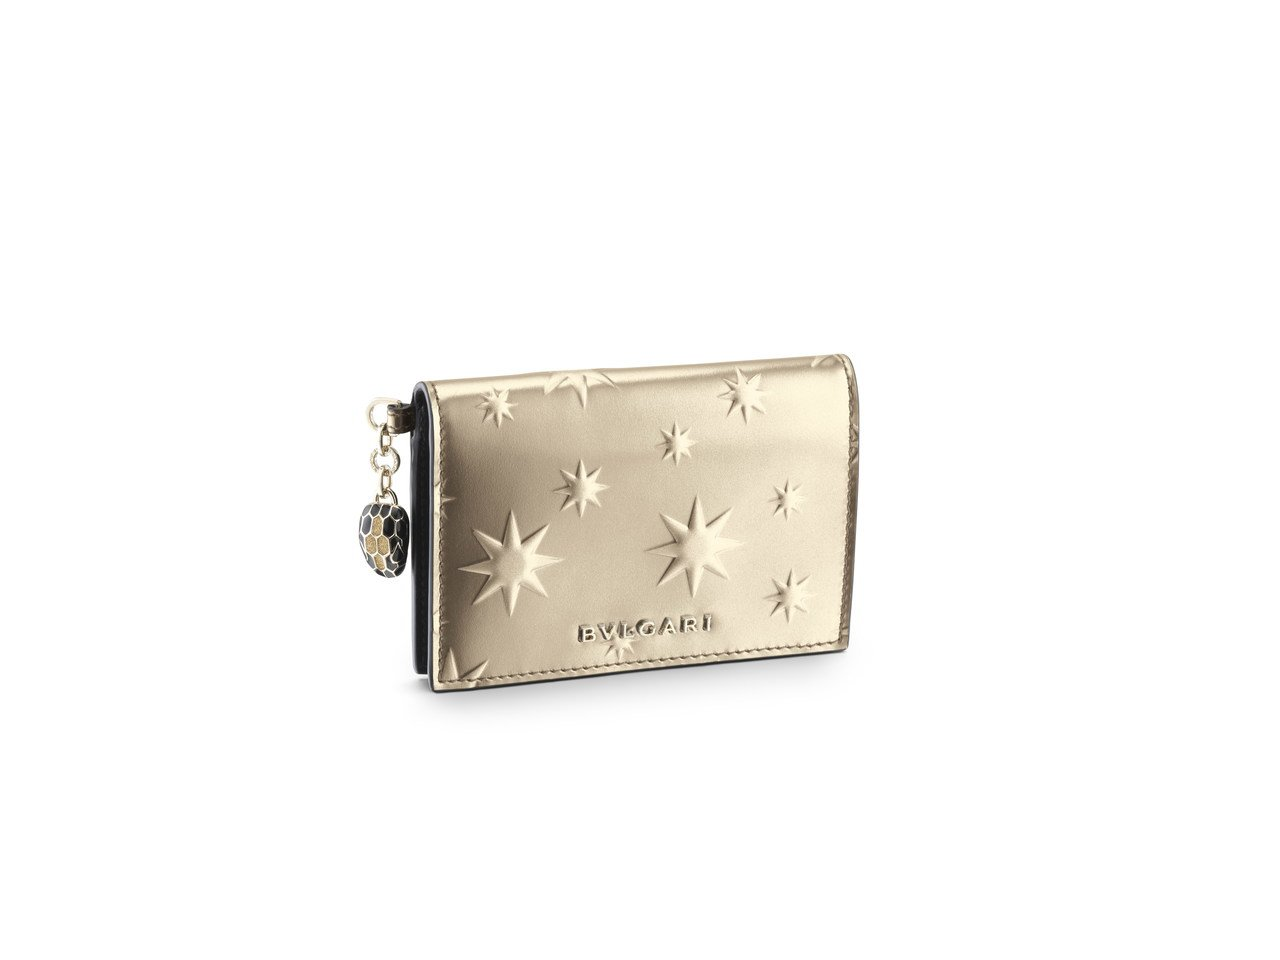 SERPENTI FOREVER冬季佳節系列古銅色小牛皮信用卡夾,12,900元...